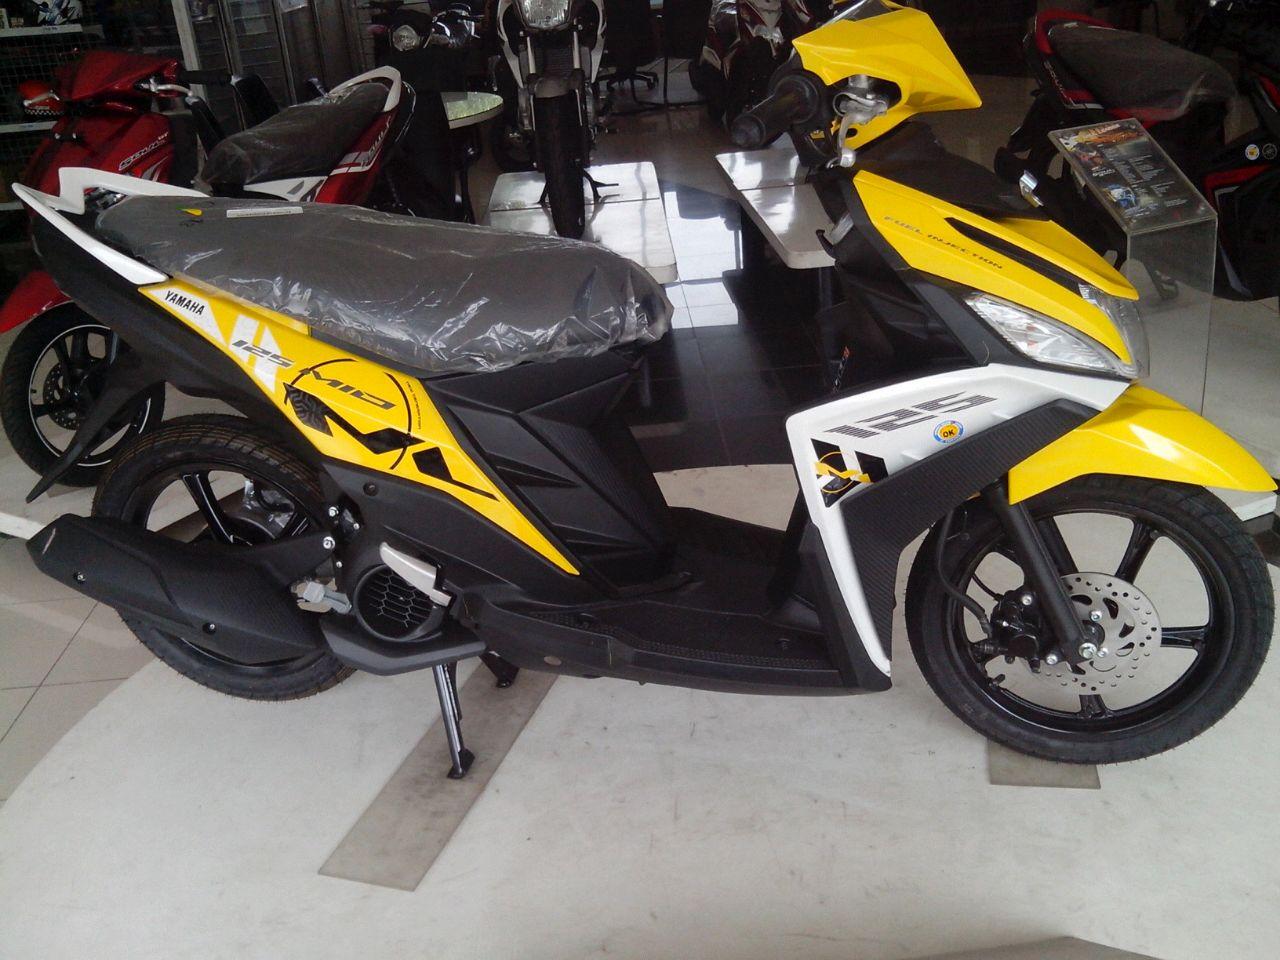 50 Modif Motor Mio Warna Kuning Gambar Mobil Dan Motor